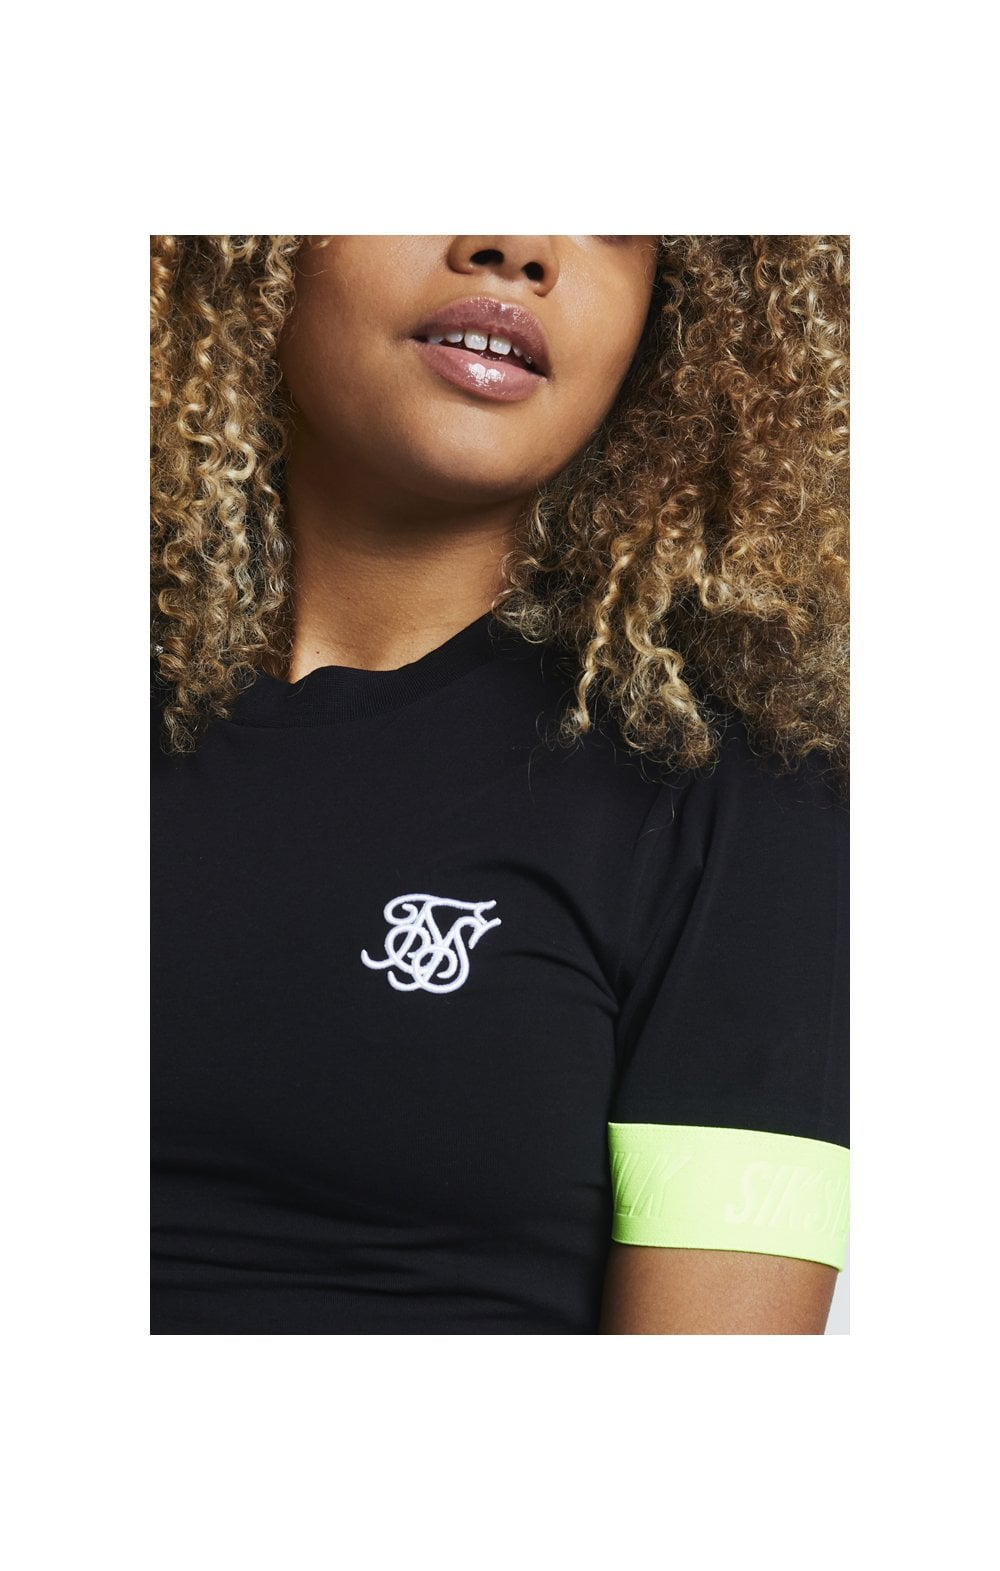 SikSilk Neon Tape Crop Tee - Black WOMEN SIZES: 6-XXS